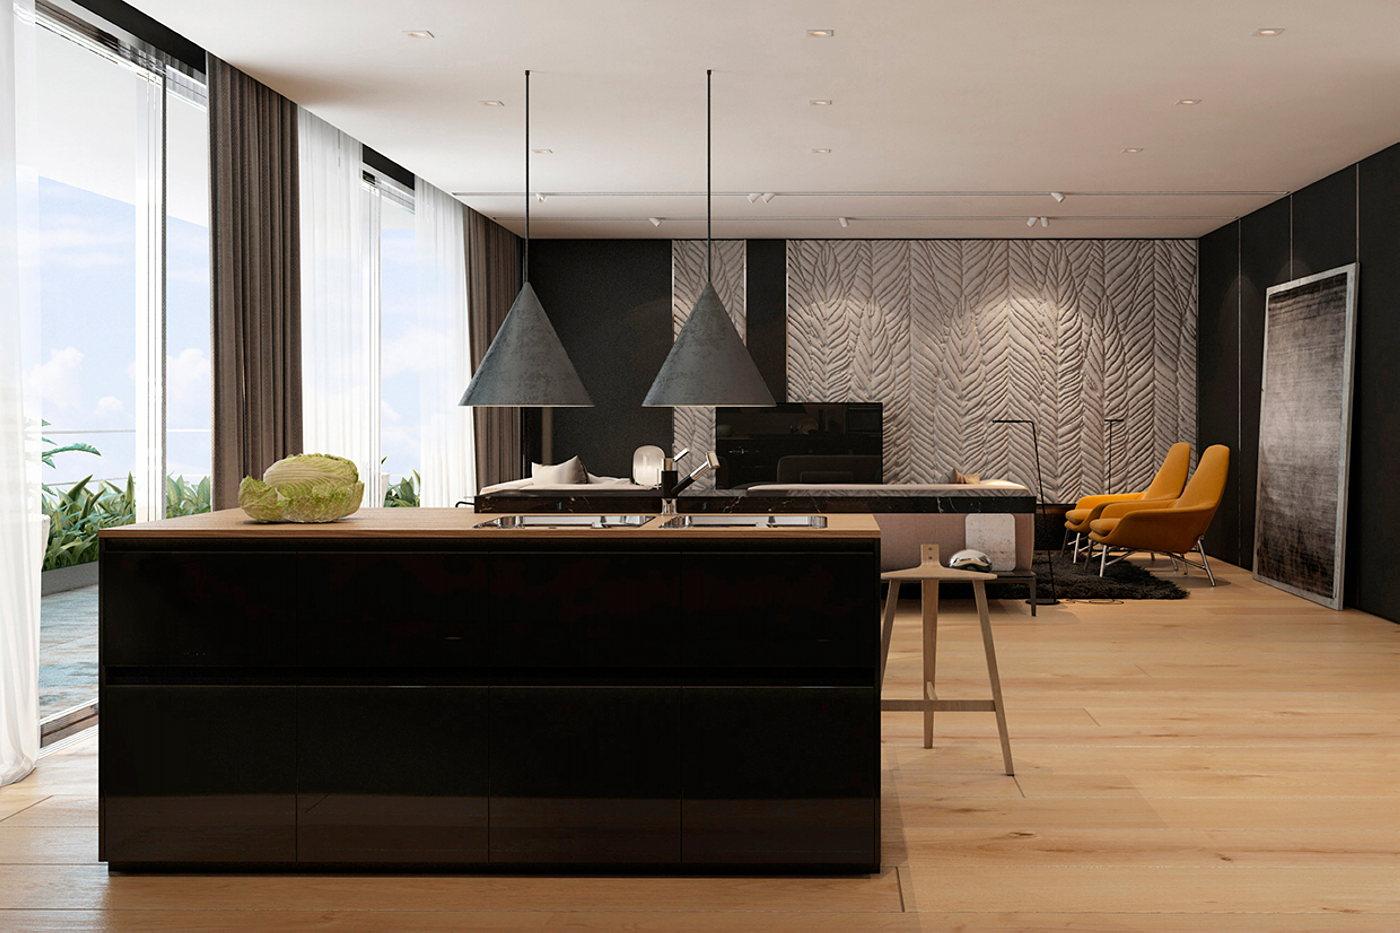 Gallery Of Cheap Apartments Tel Aviv Idea Interior Of Modern Apartments In Tel Aviv From Iryna Dzhemesiuk 3